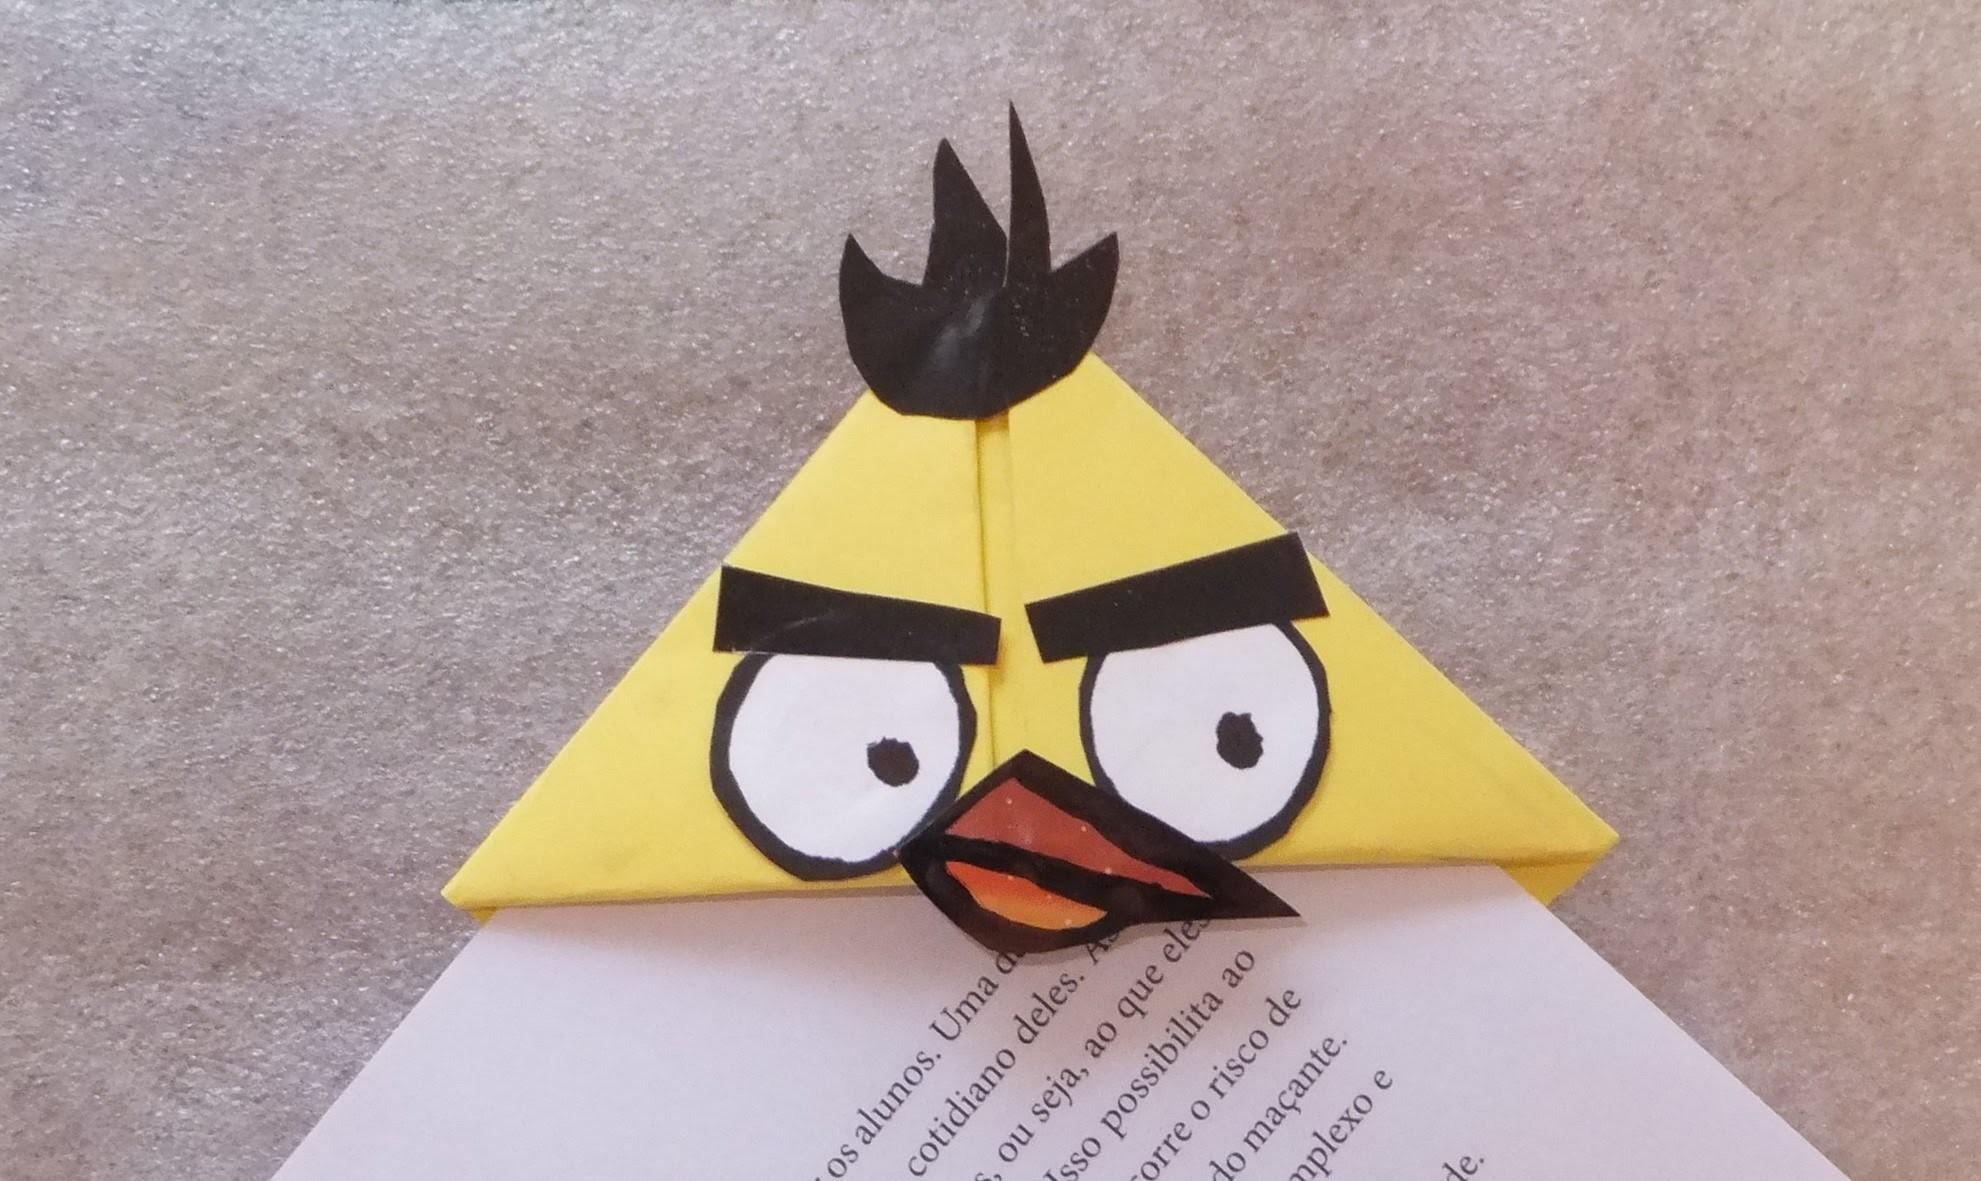 DIY Volta as aulas, Angry Birds marcador de livros  - pássaro amarelo